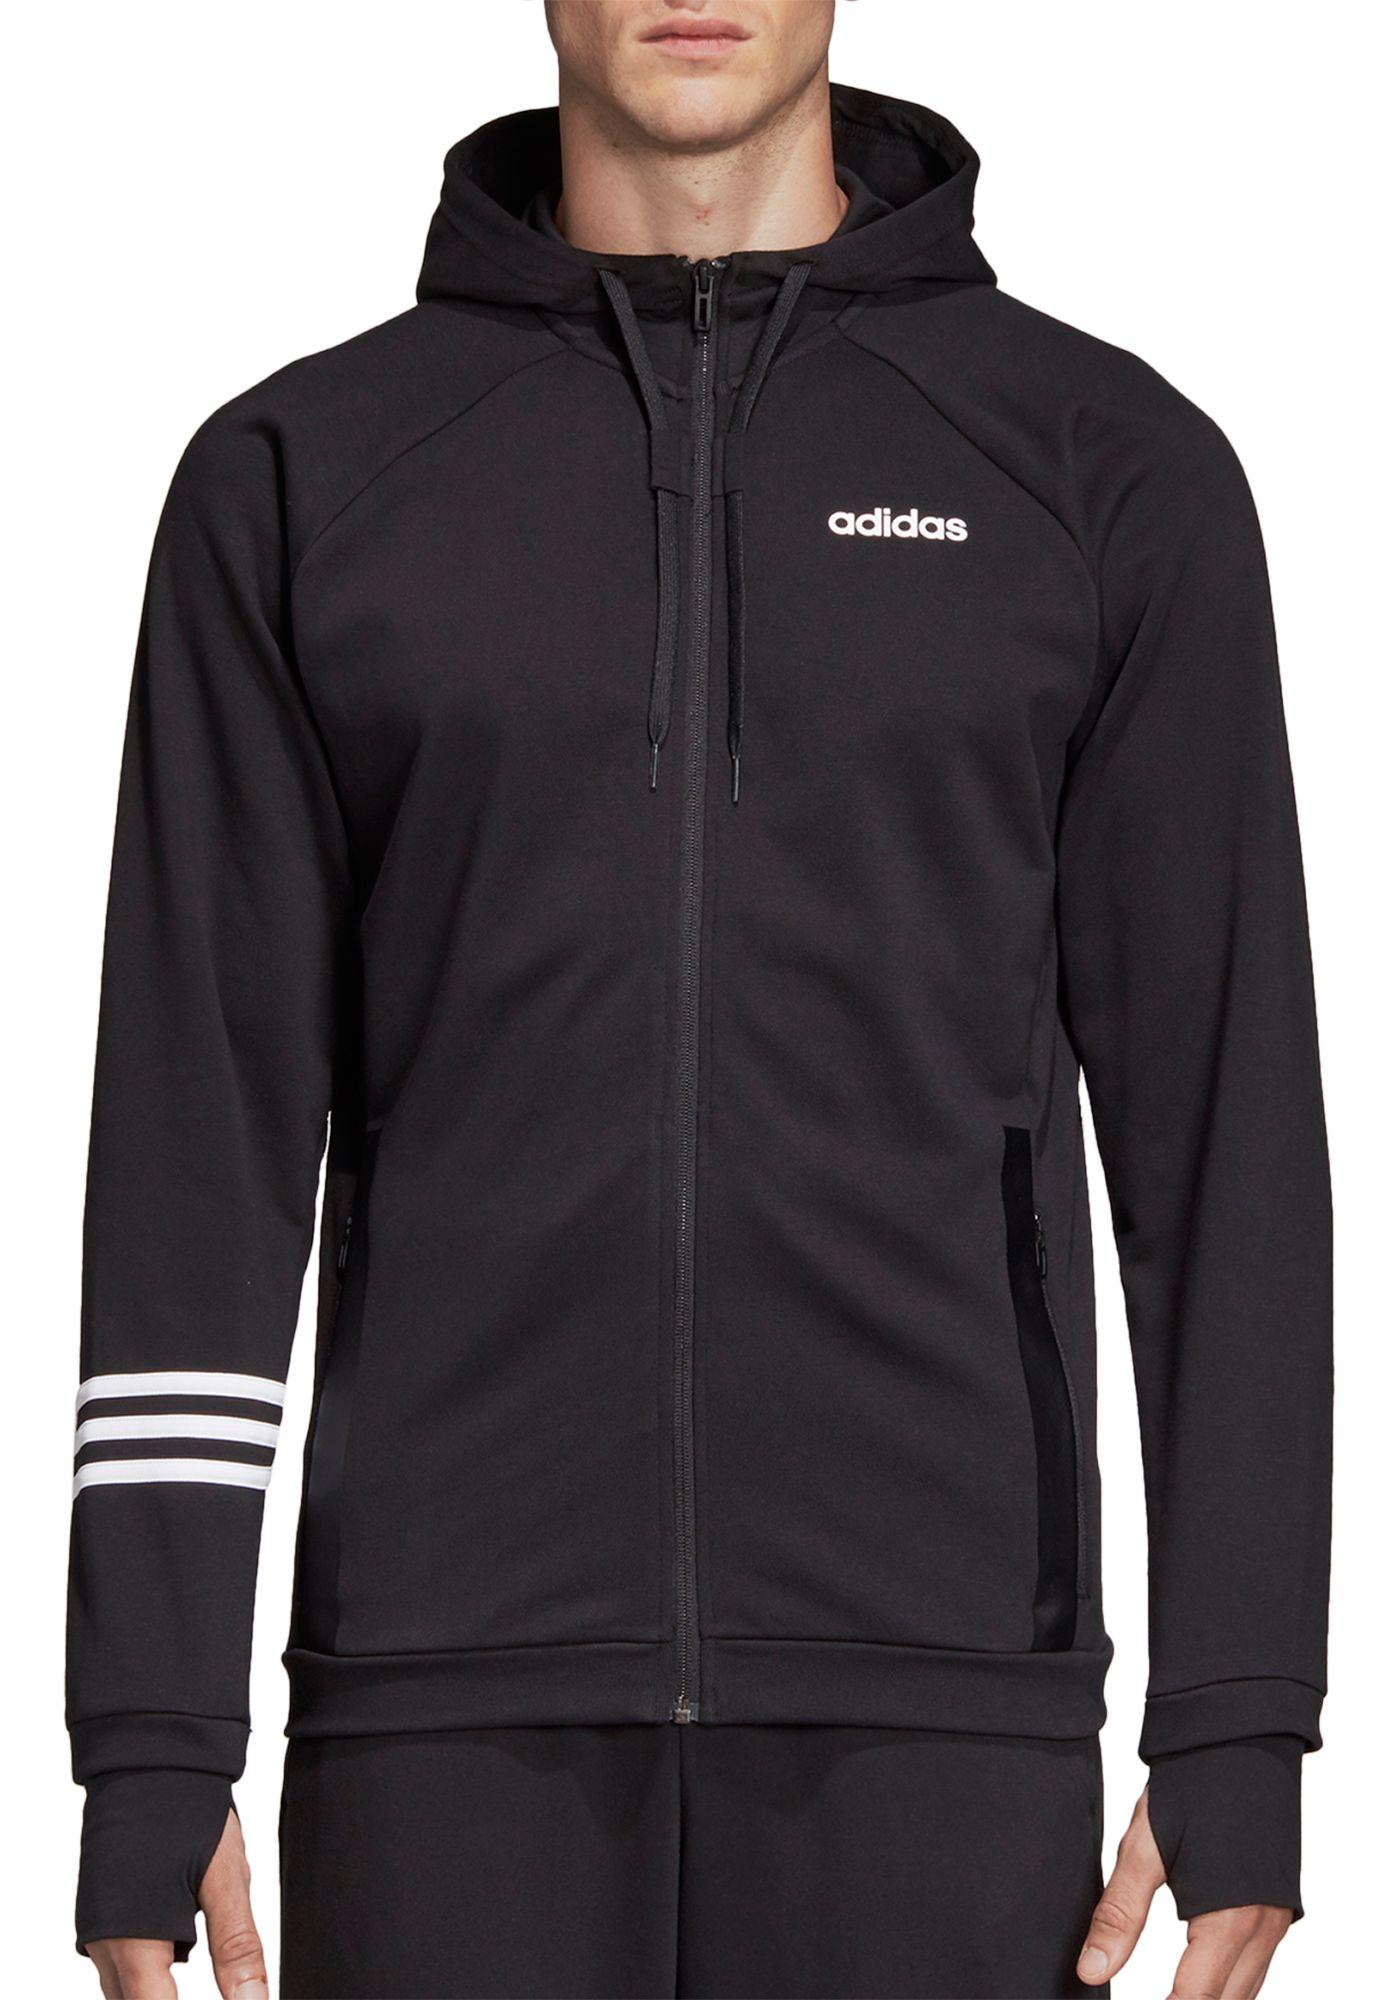 adidas Men's Essentials Motion Pack Track Jacket